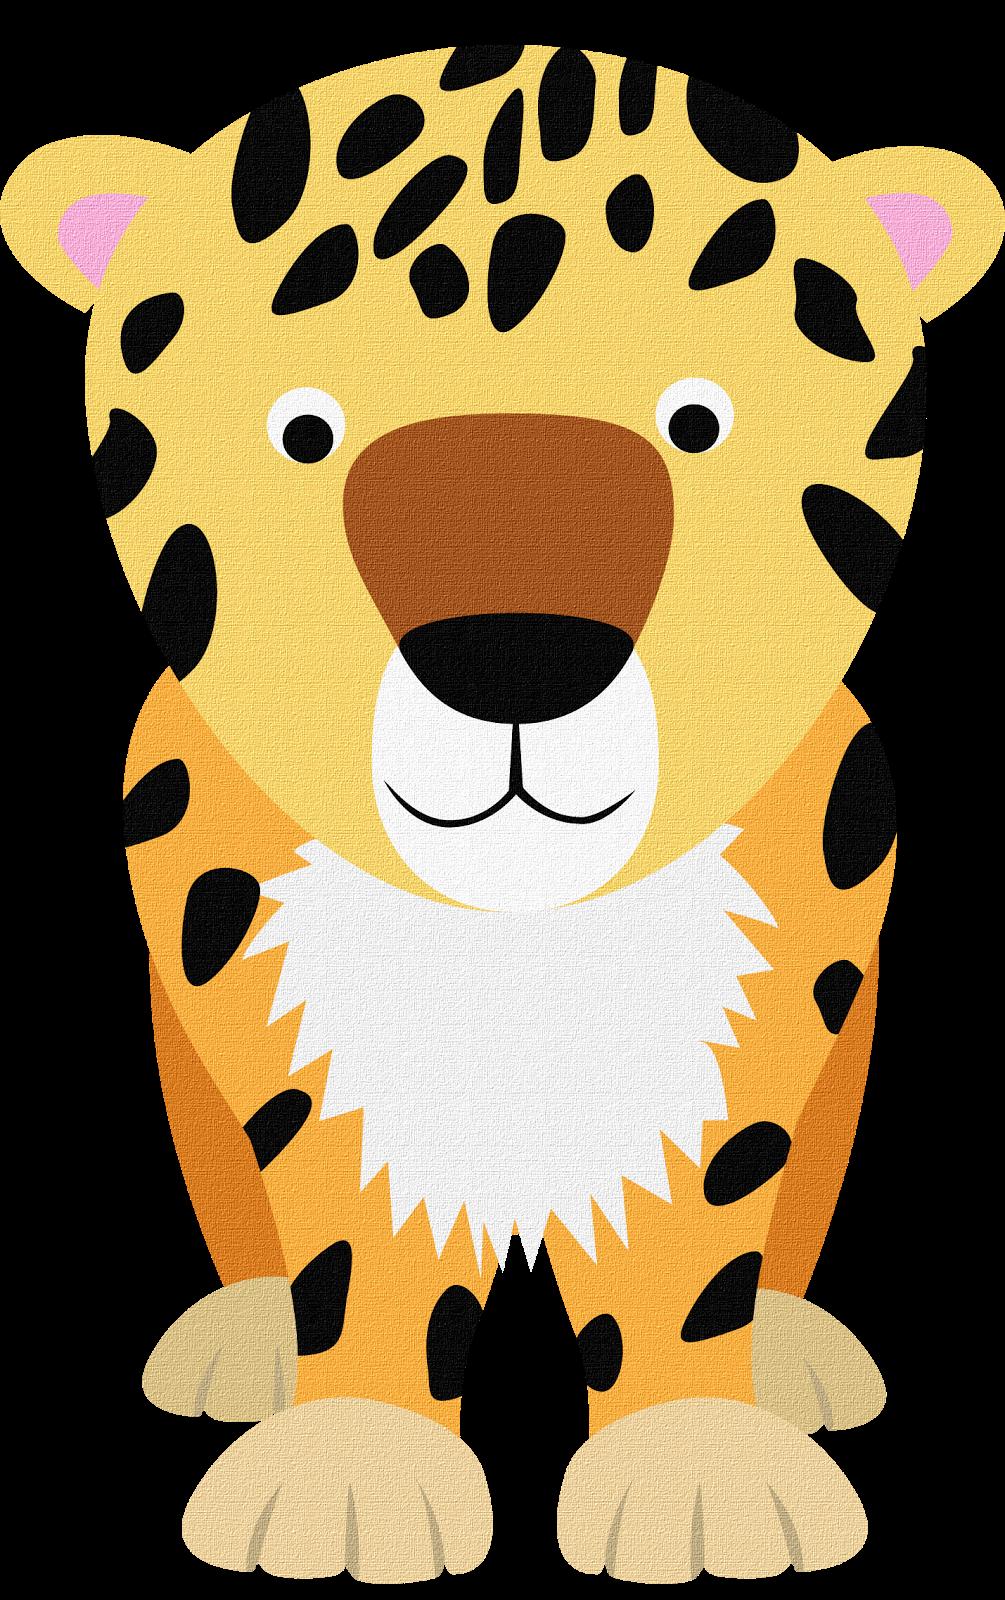 Safari png on a. Clipart zebra theme jungle